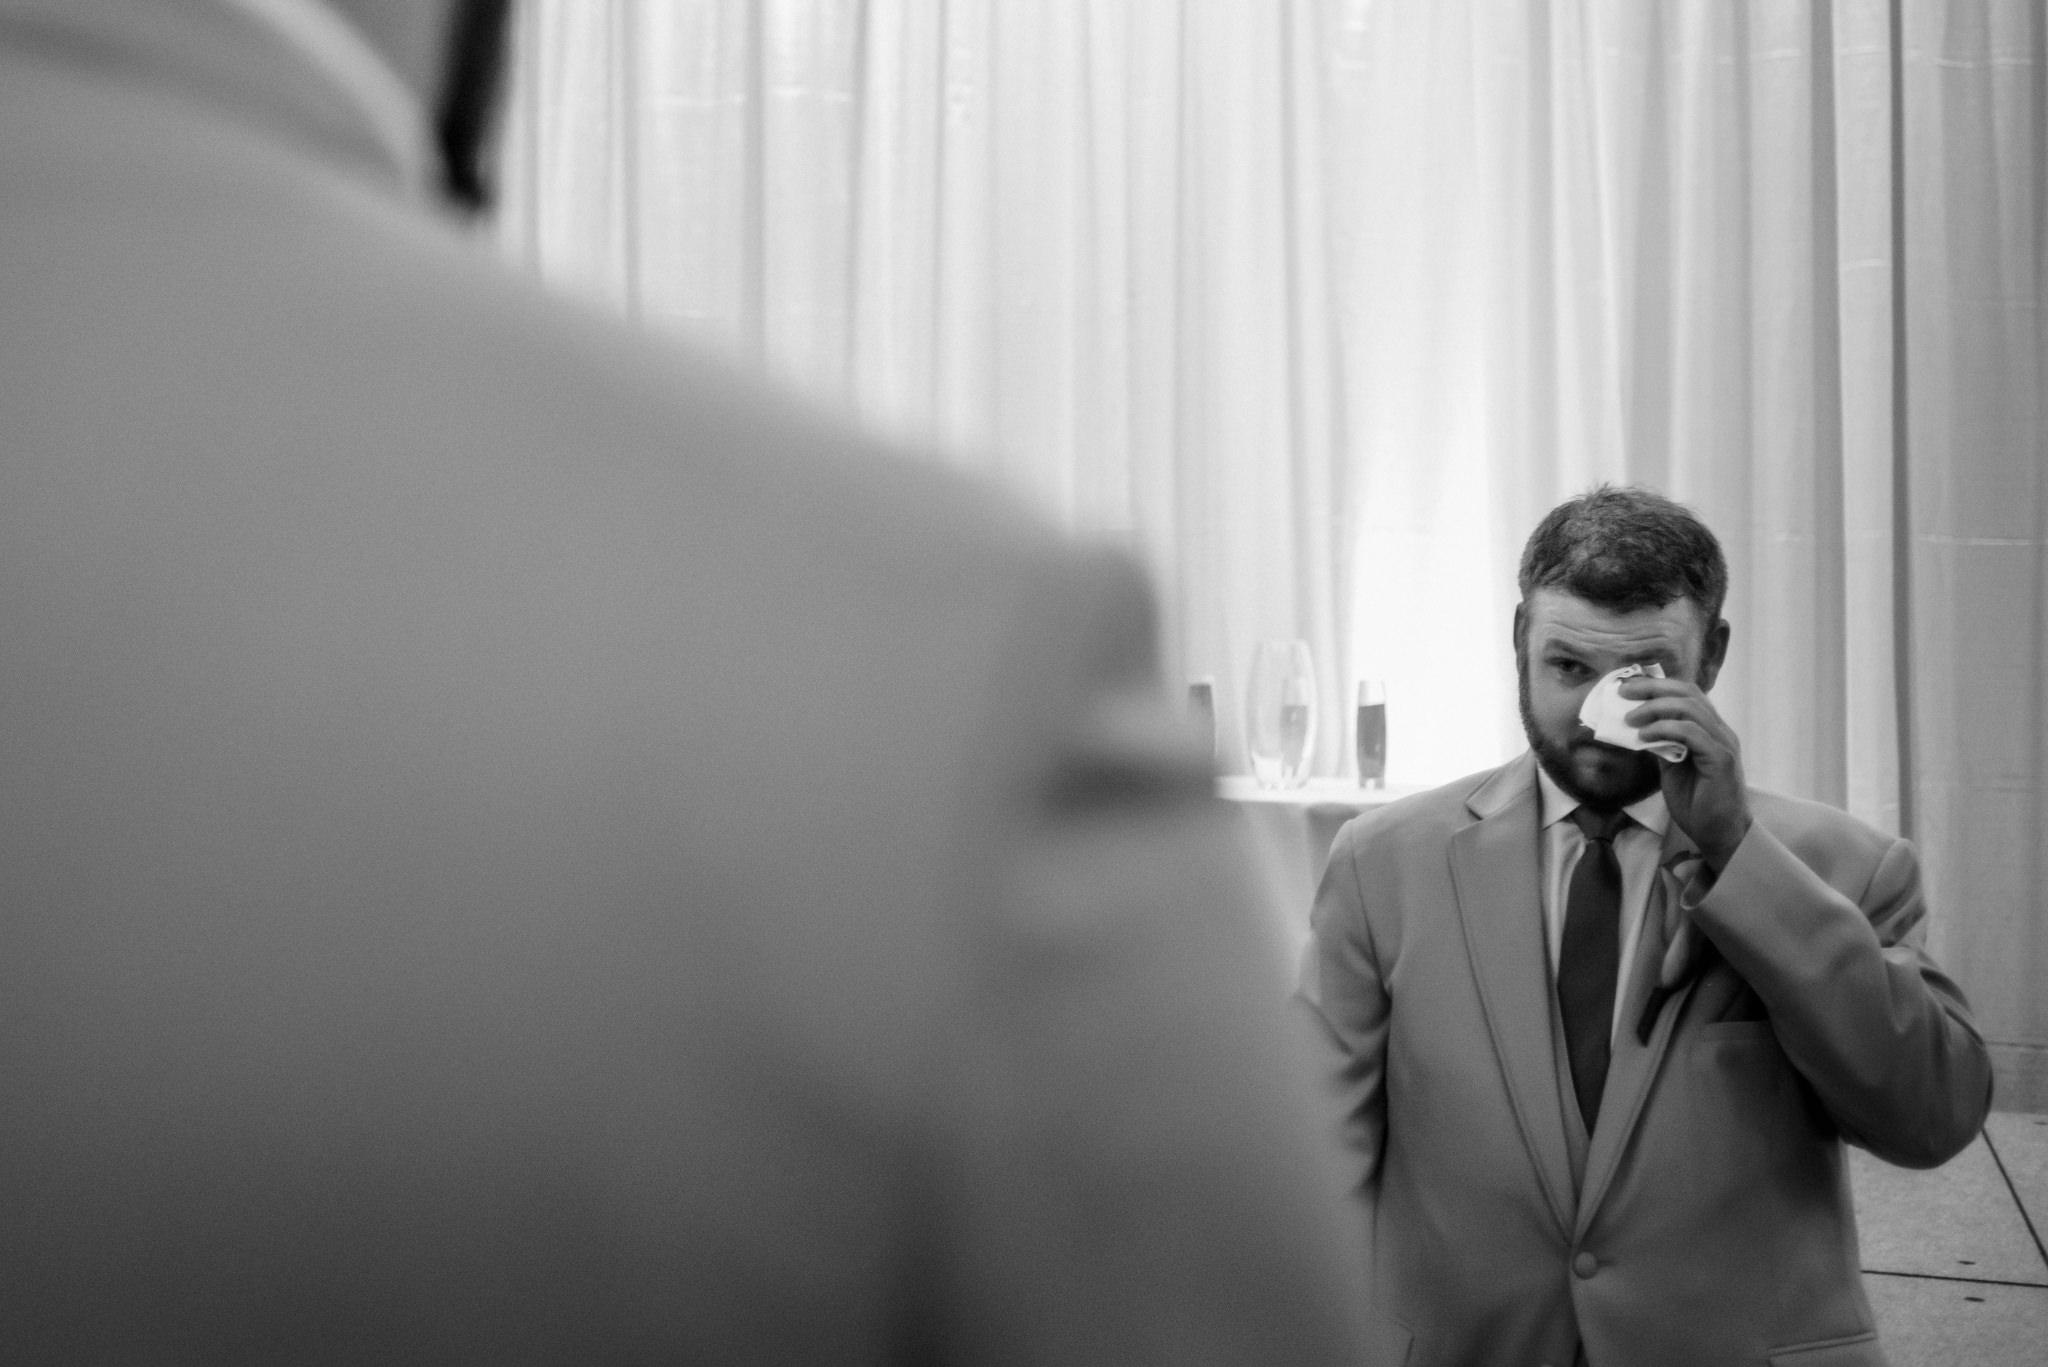 HILTON-OMAHA-WEDDING-PHOTOGRAPHER-JM-STUDIOS-OMAHA-LIV-BRICE-024.jpg